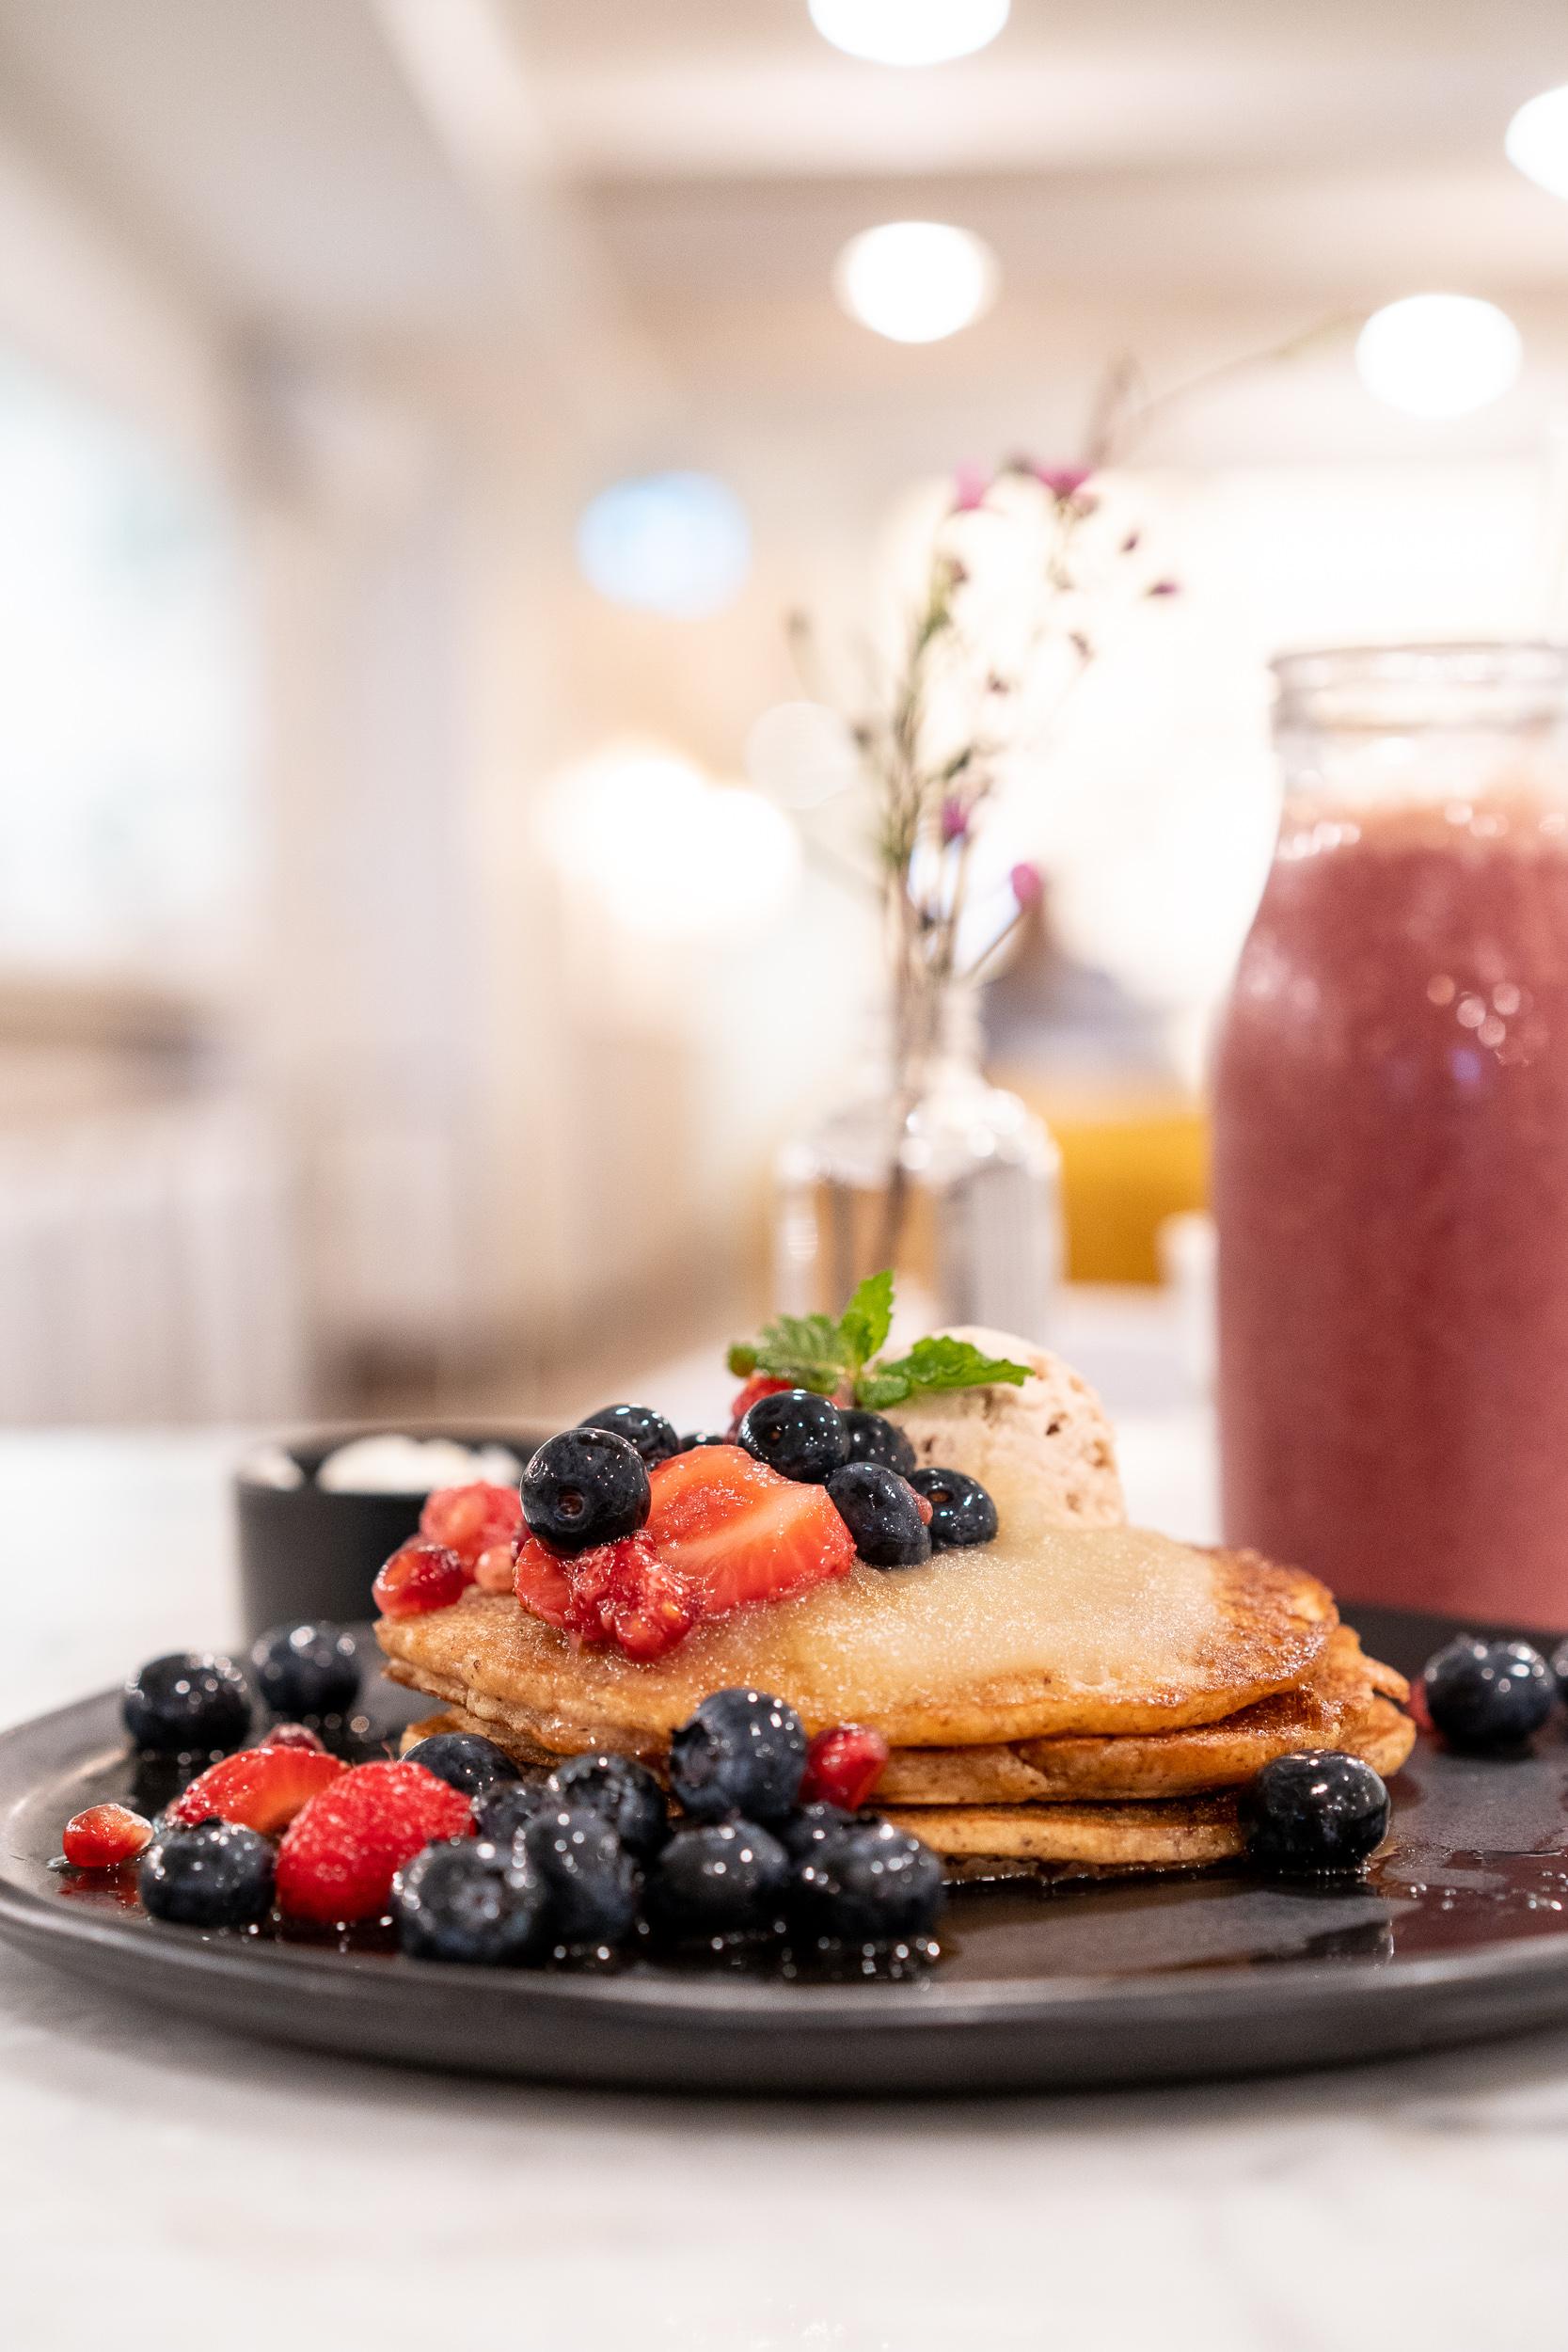 Apple Pancakes with fresh fruit.